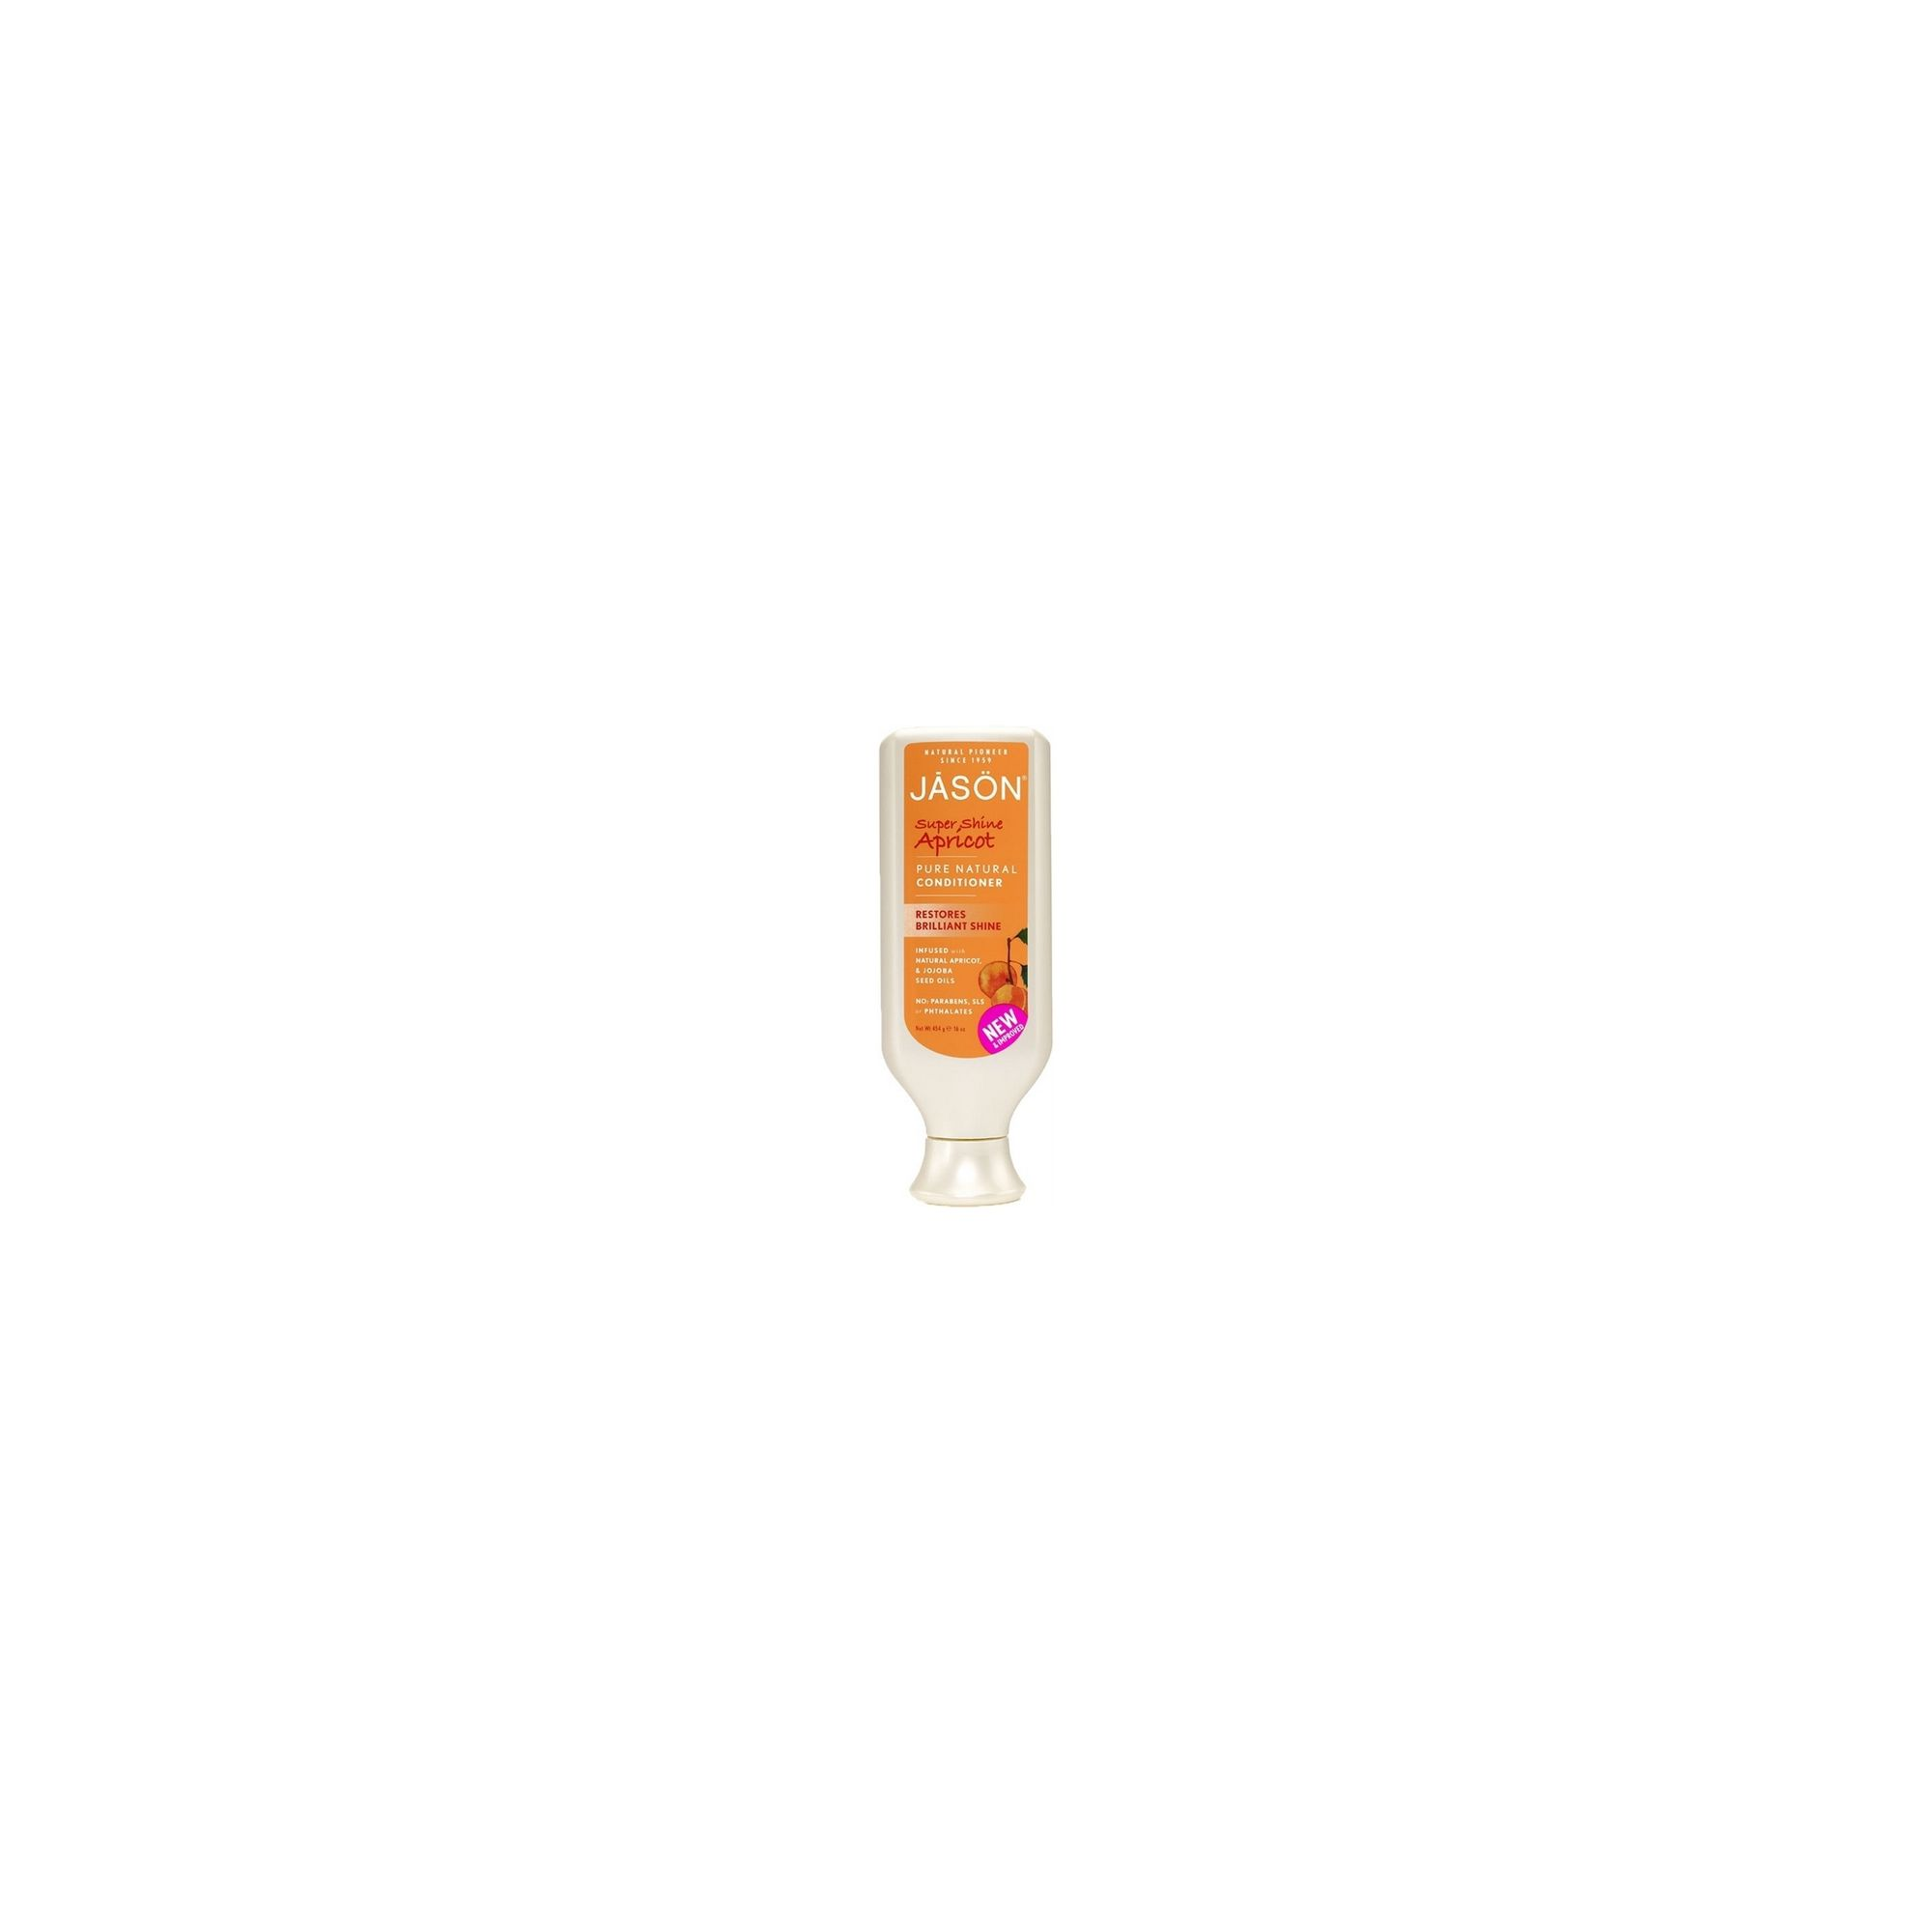 Apricot/Keratin Conditioner Organic